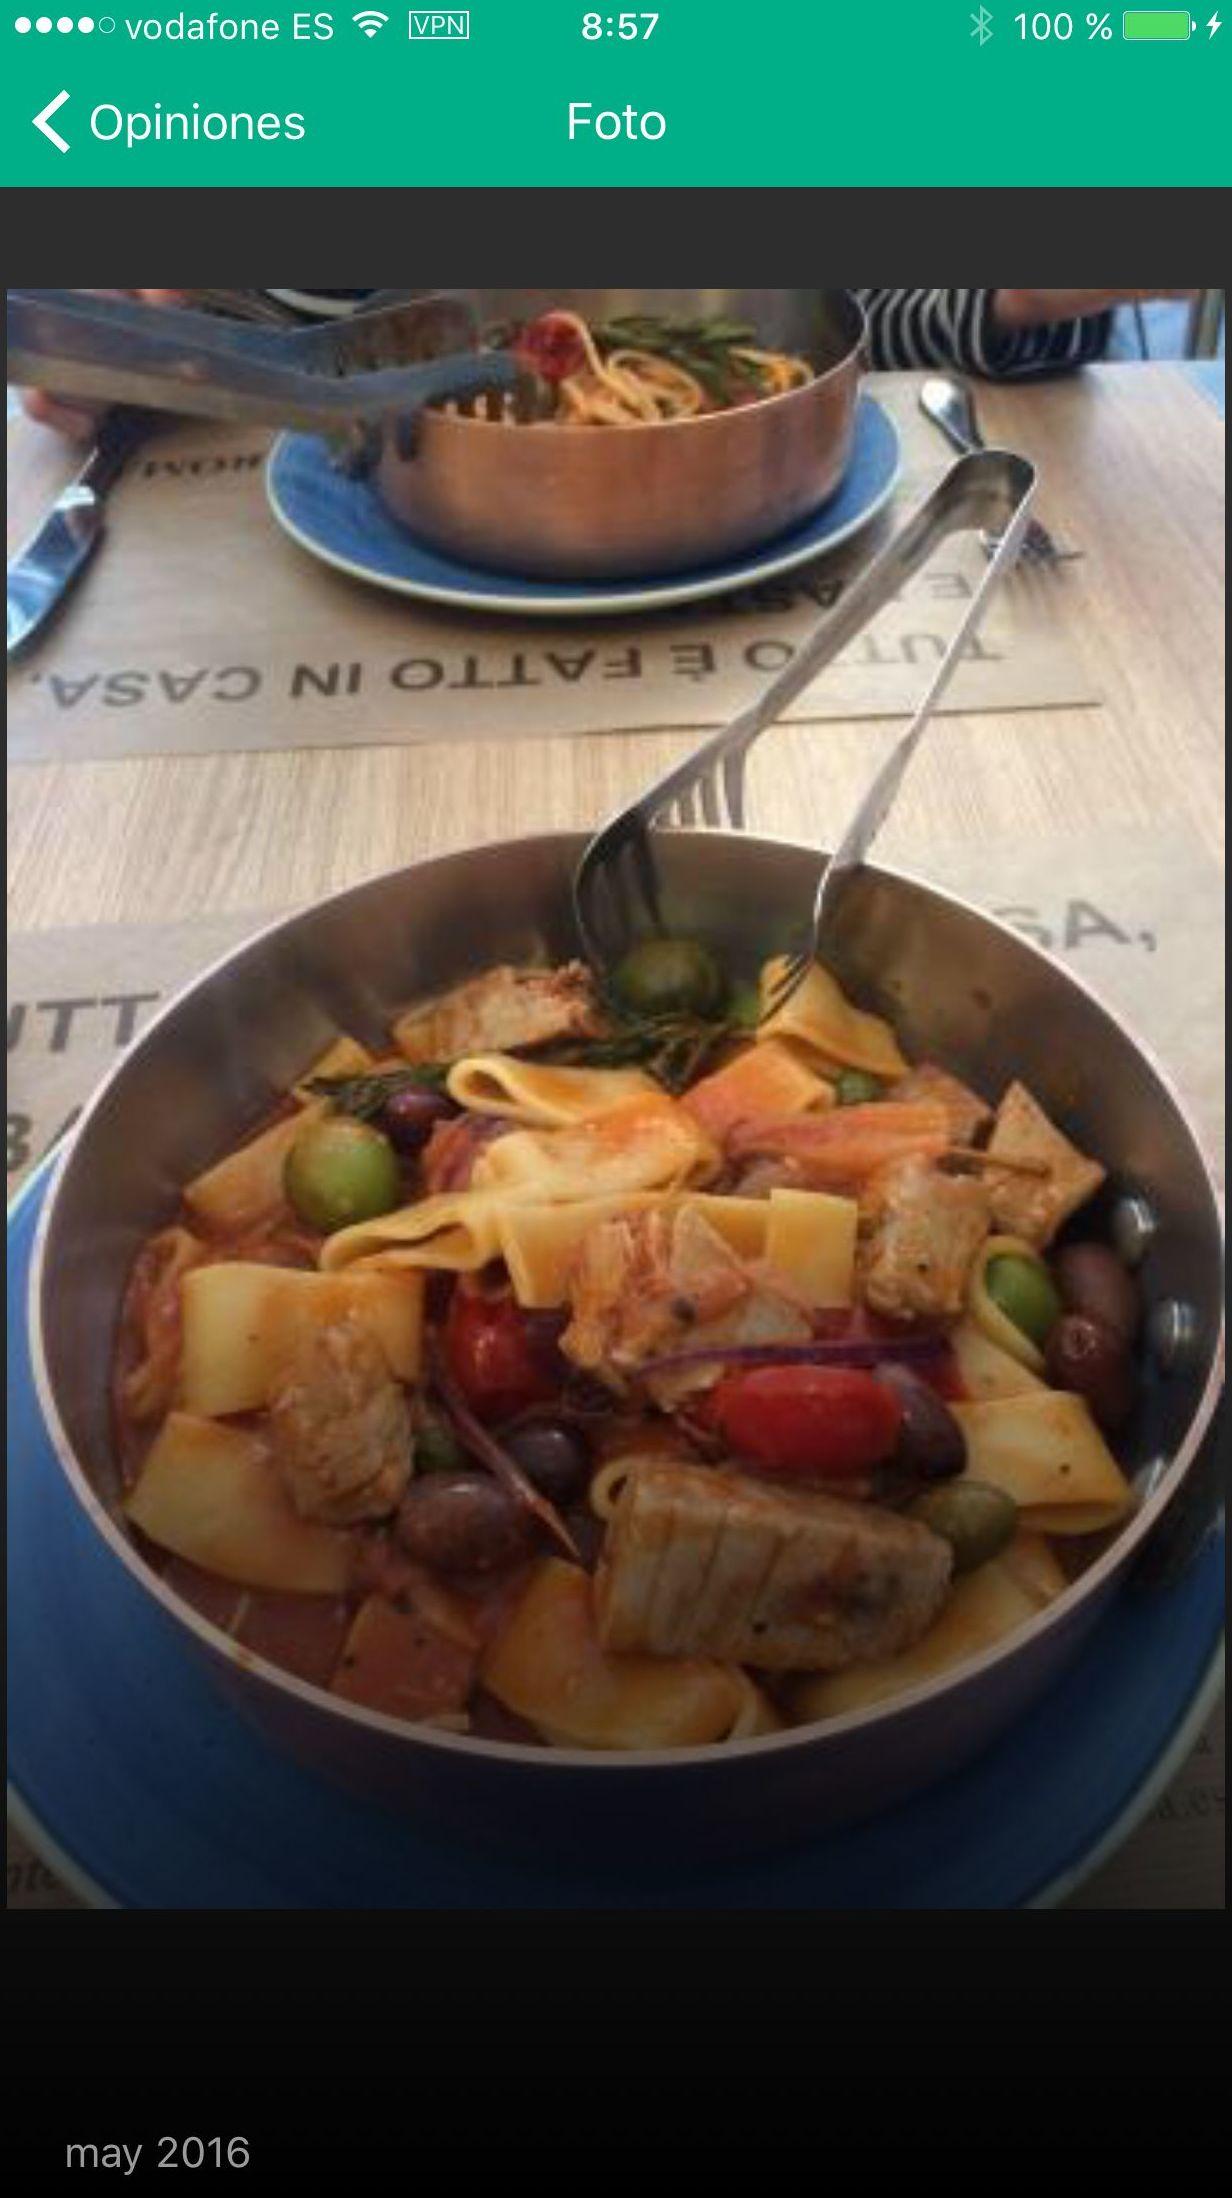 Foto 17 de Cocina italiana en VALENCIA | Pizza Roma